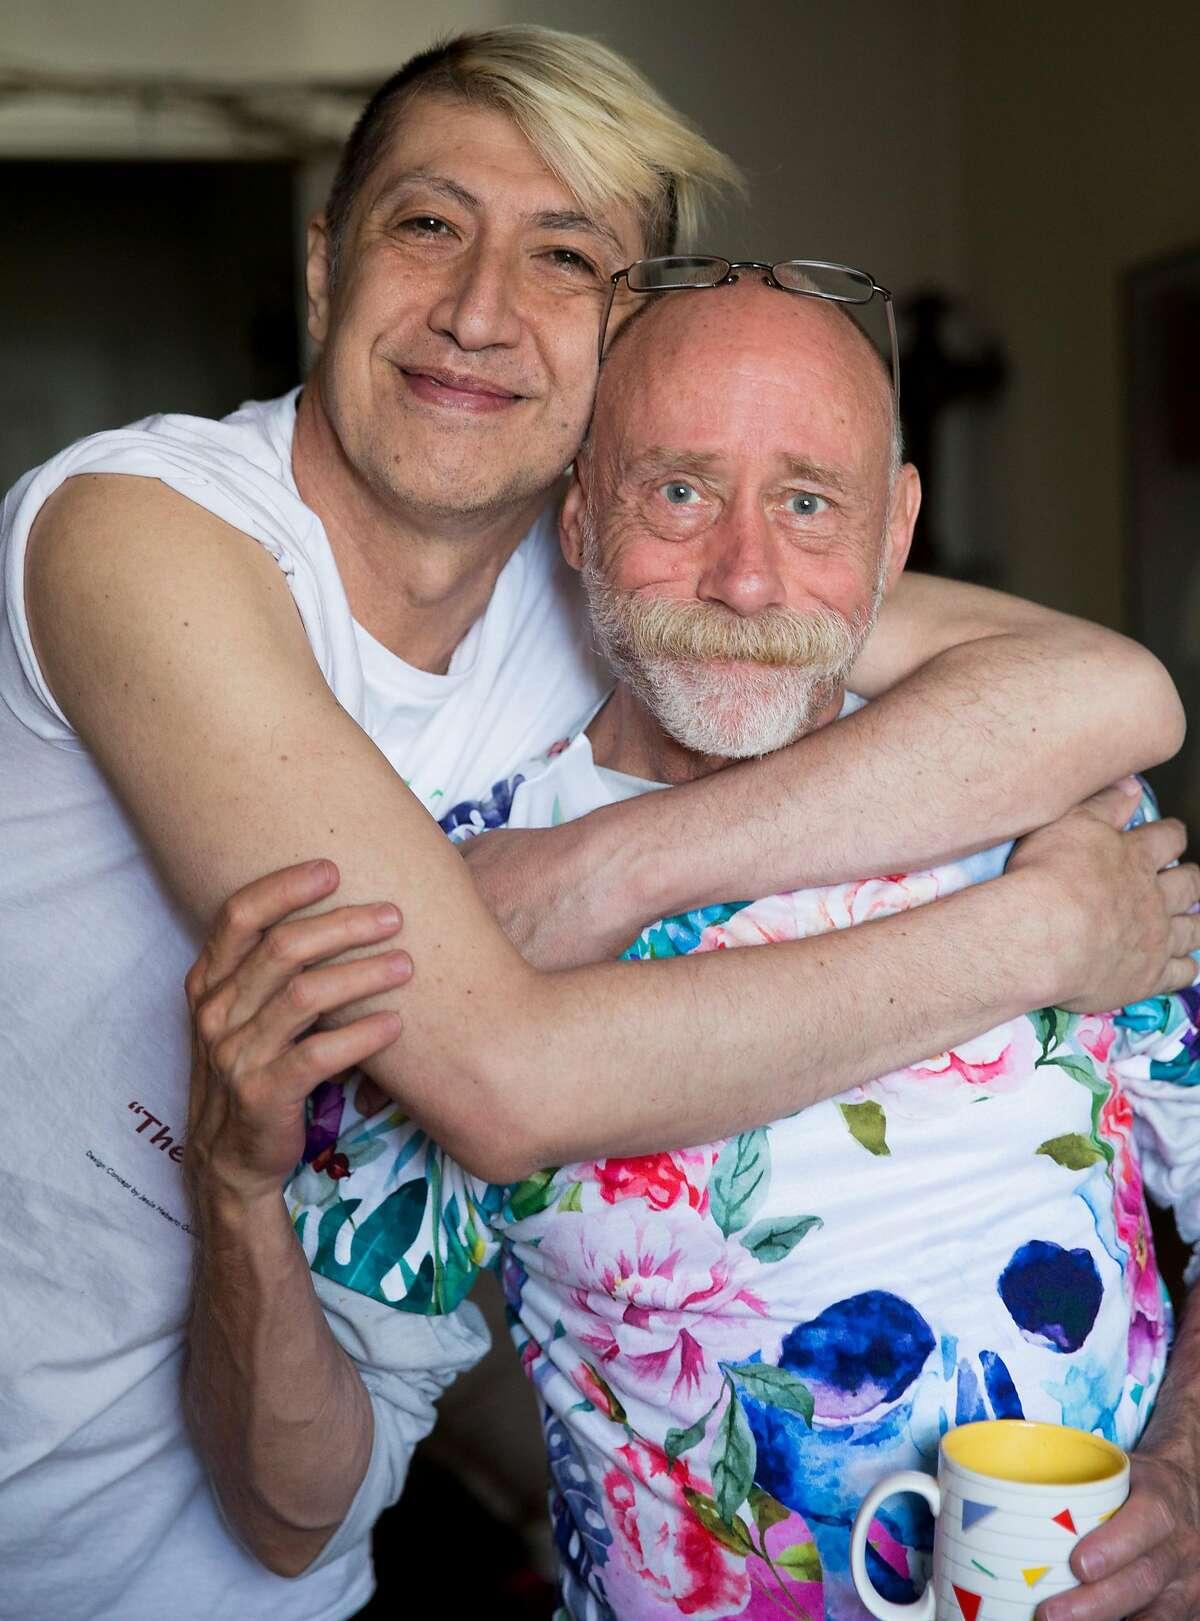 Jesus Guillen, a longterm HIV survivor, left, poses for a portrait with fellow longterm survivor Robert Riester of Denver, Colorado while at Guillen's apartment in San Francisco, Calif. Thursday, Oct. 18, 2018.